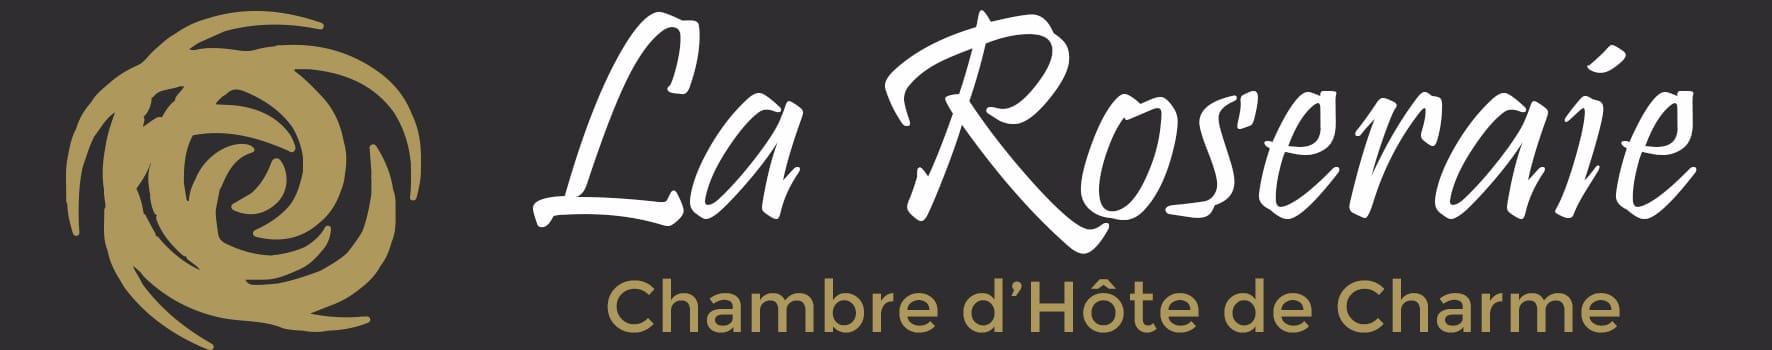 La Roseraie Sentheim Logo